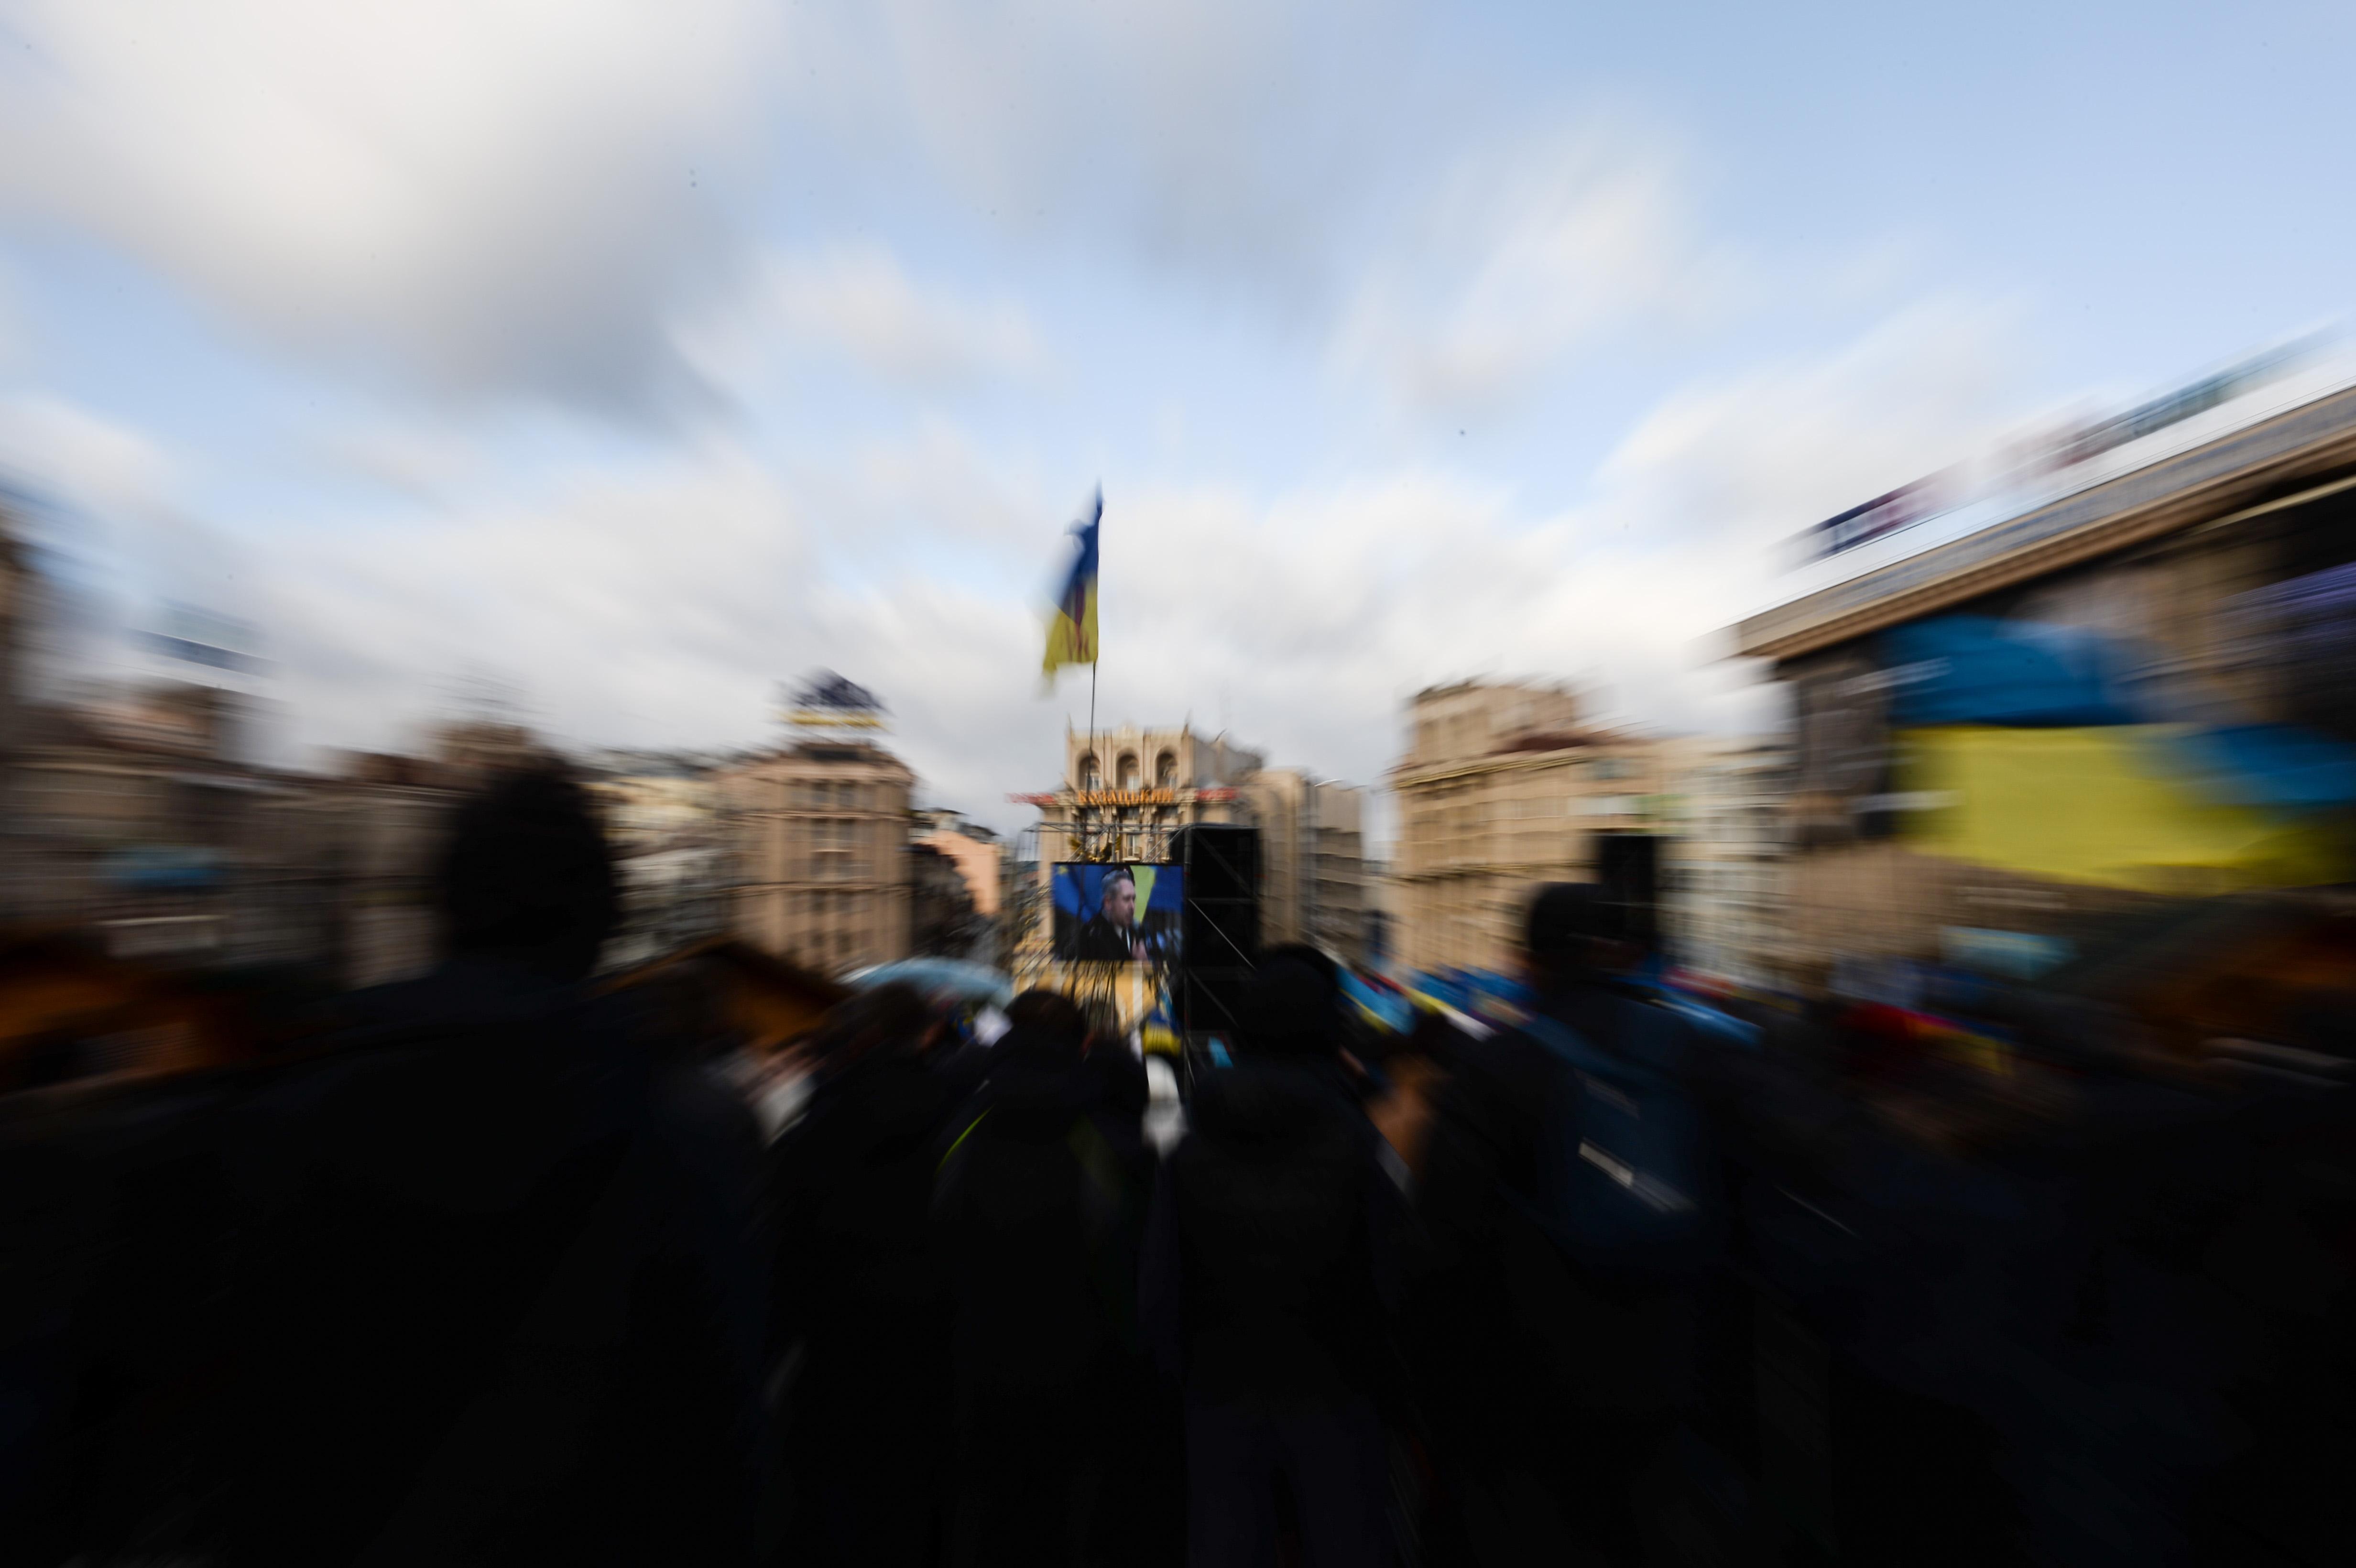 Manifestation sur la place Maïdan à Kiev © Allpix Press